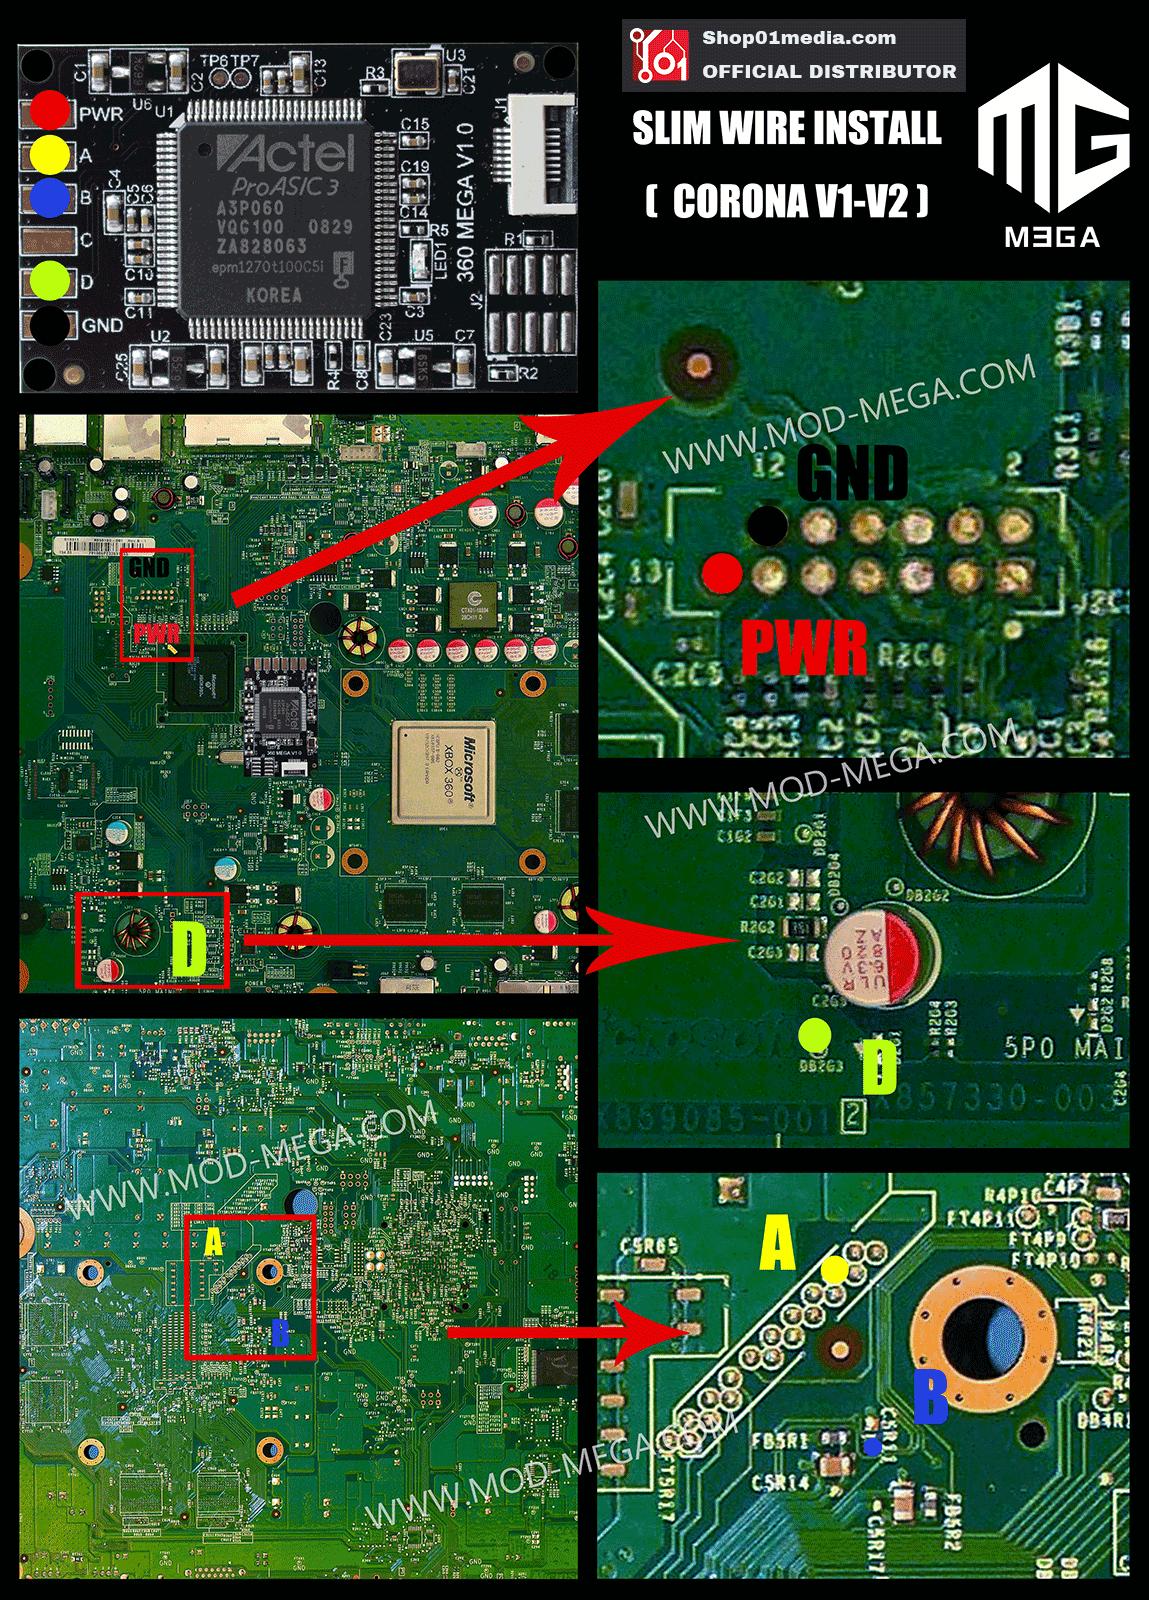 X360 Mega Mod CoolRunner, glitcher mod chip for XBox 360